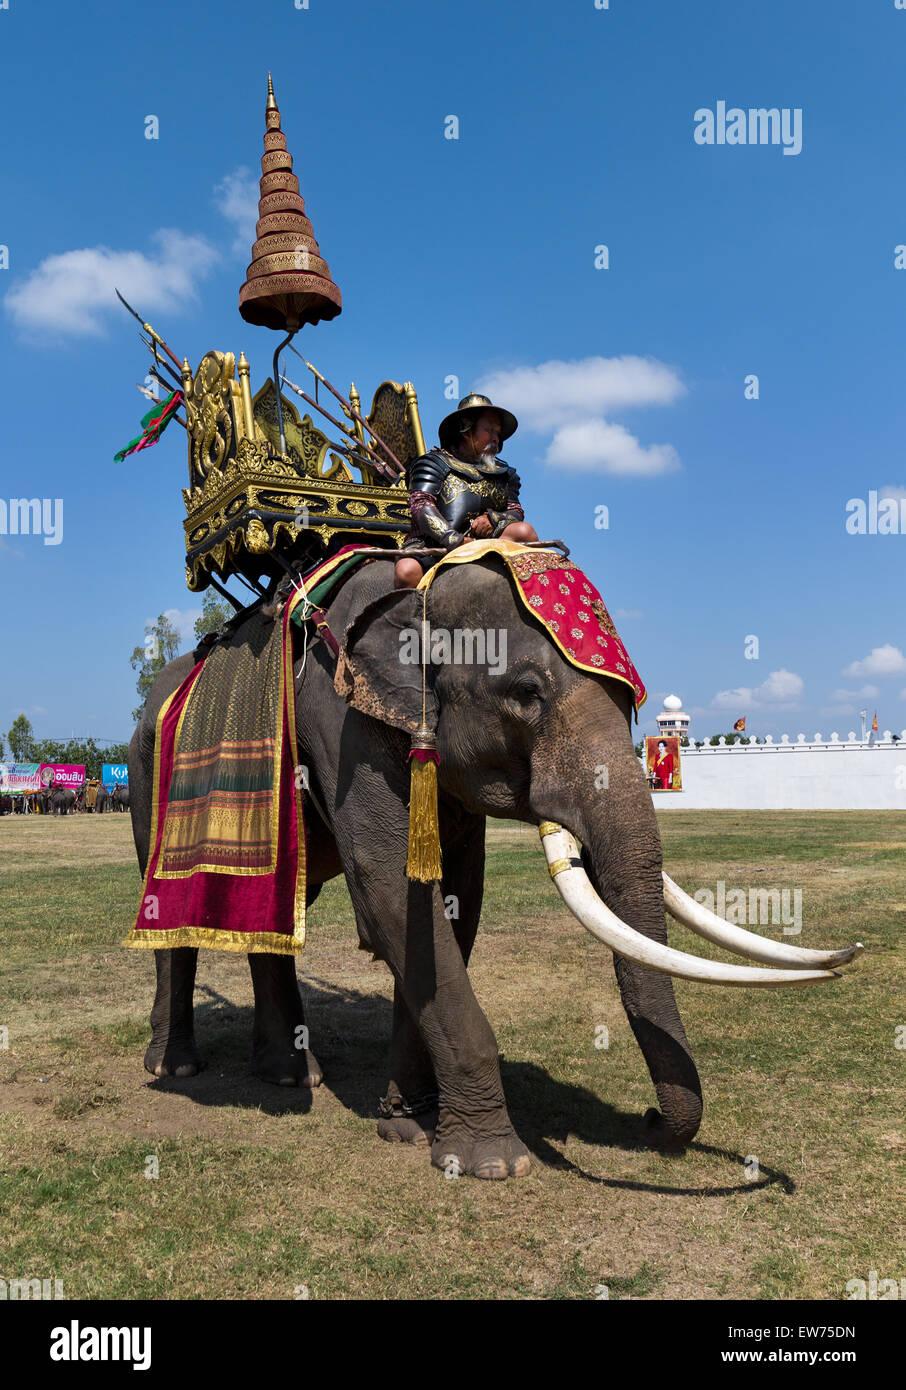 Tactics of using war elephants in ancient wars